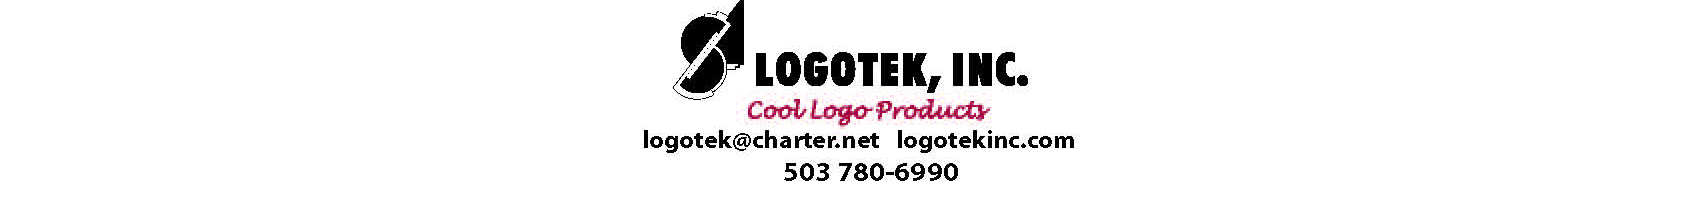 Logotek cool logo 728x90